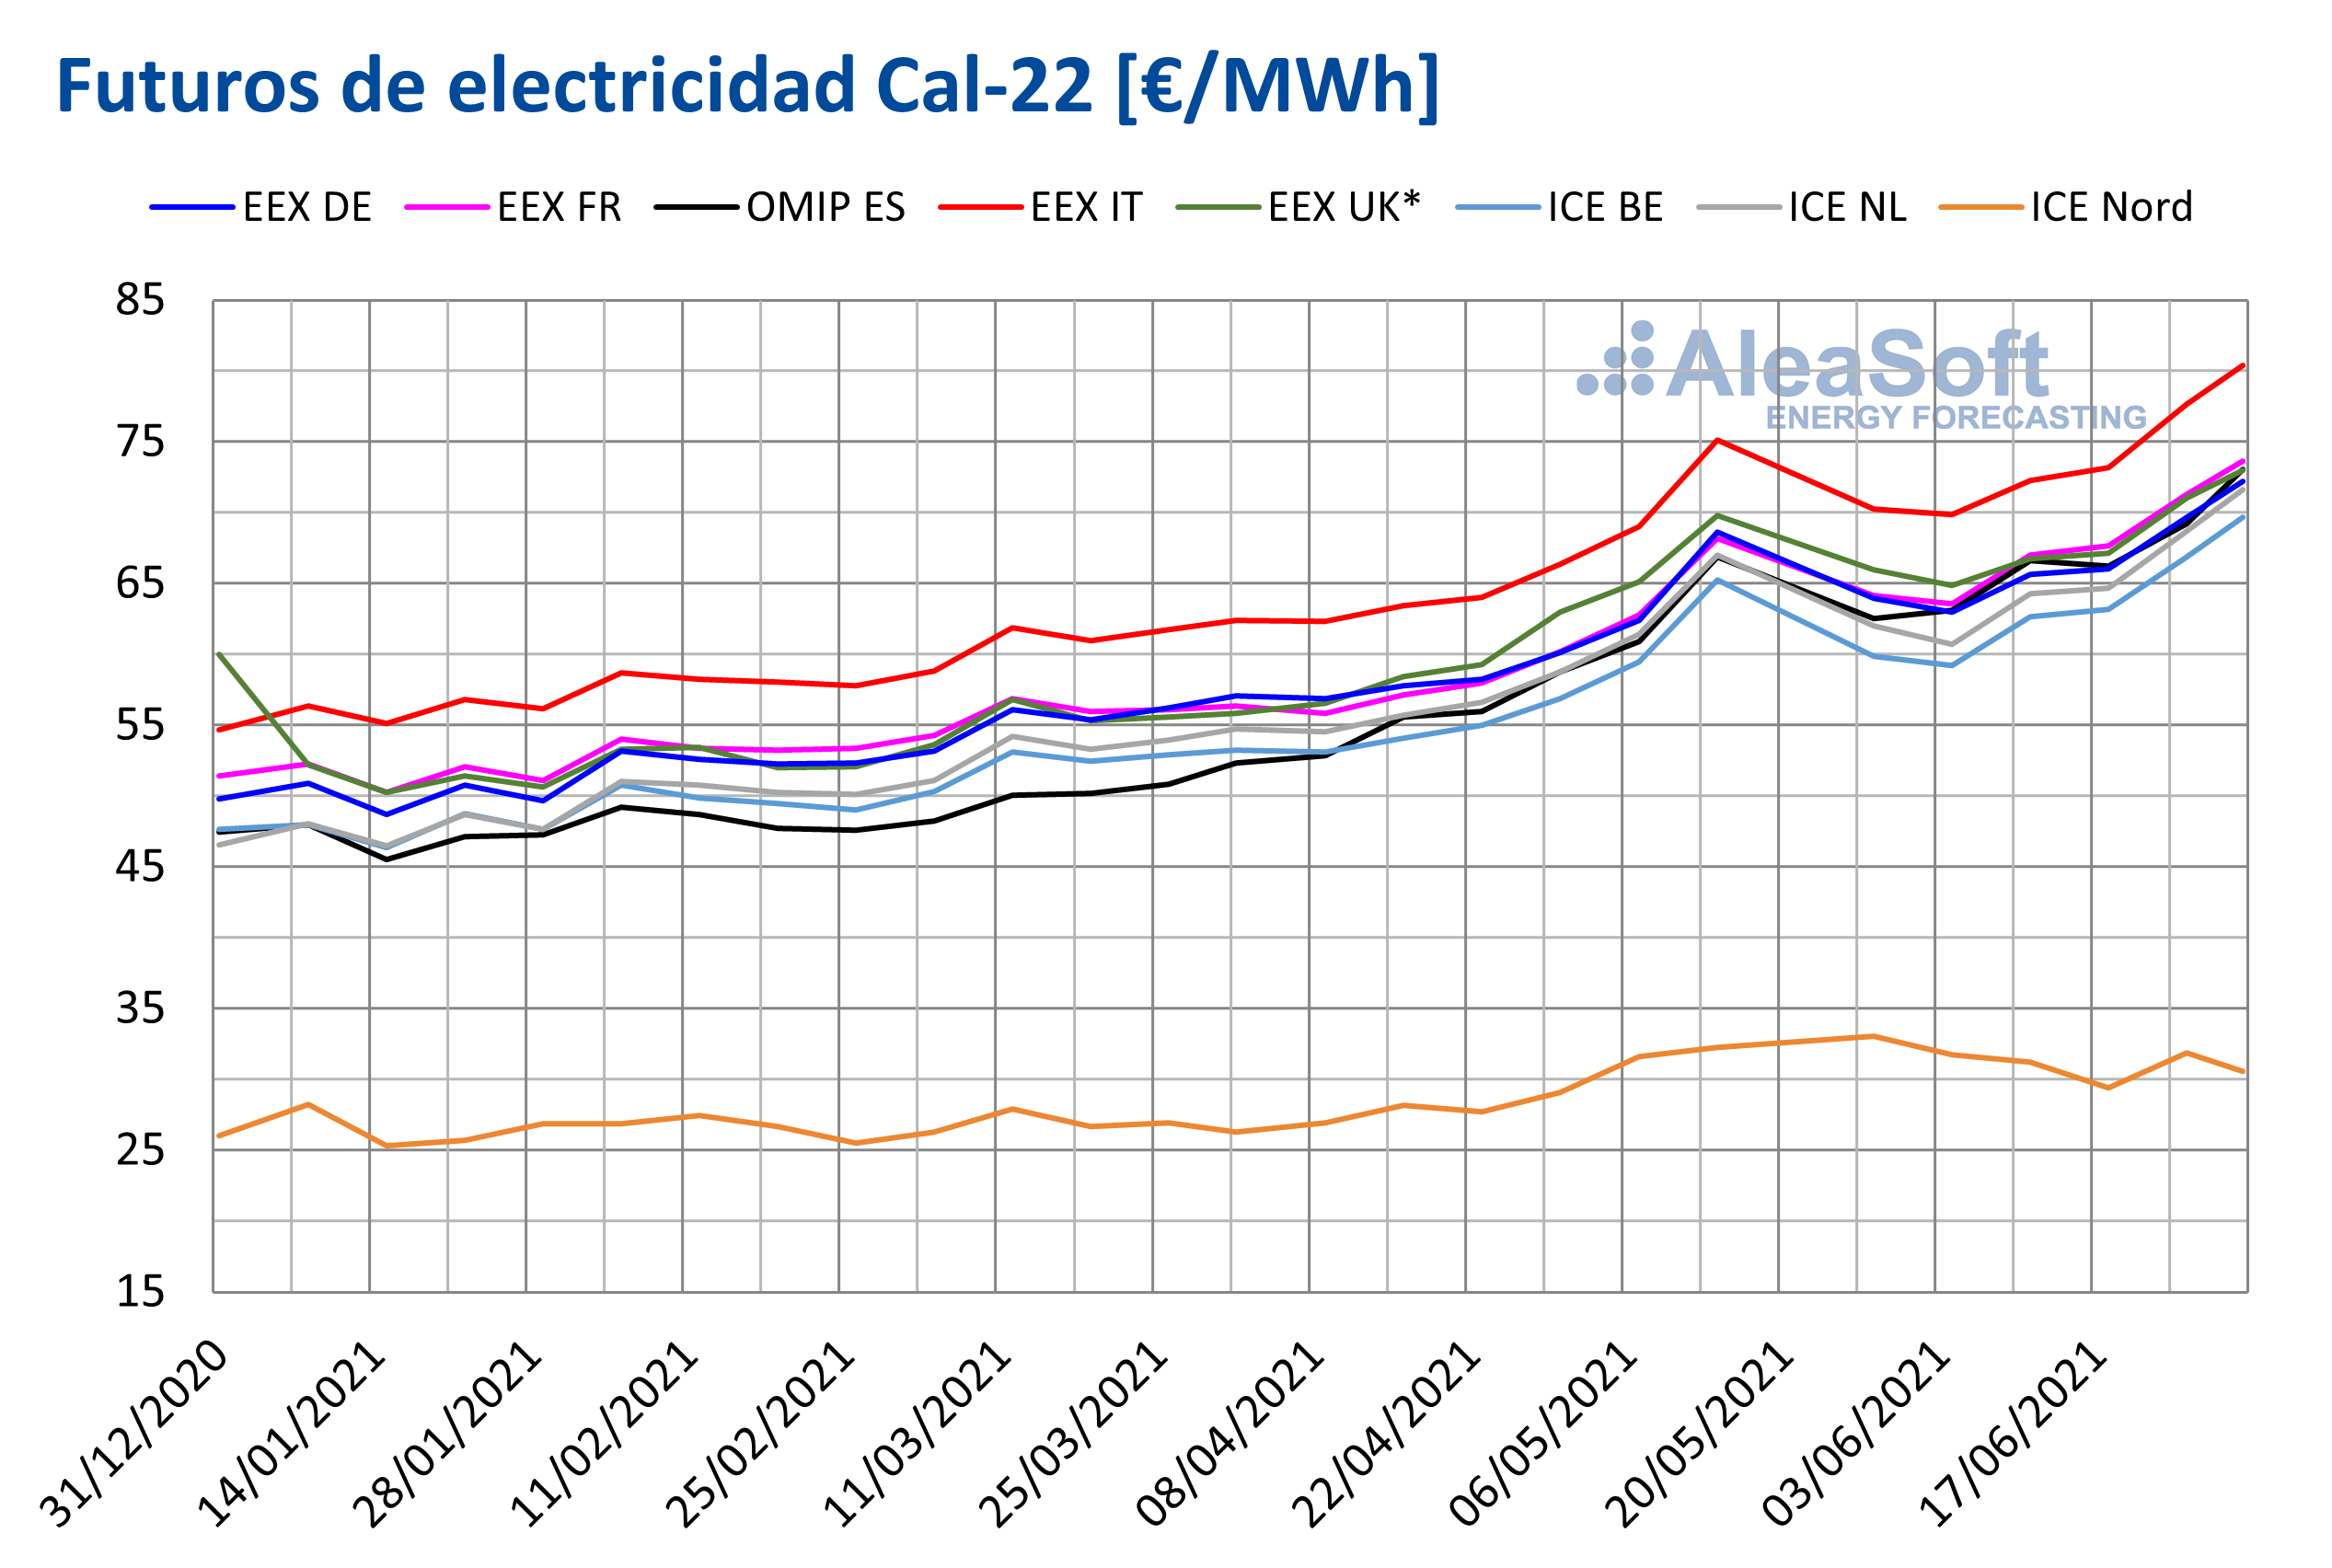 AleaSoft - Futuros electricidad cal22 primer semestre 2021